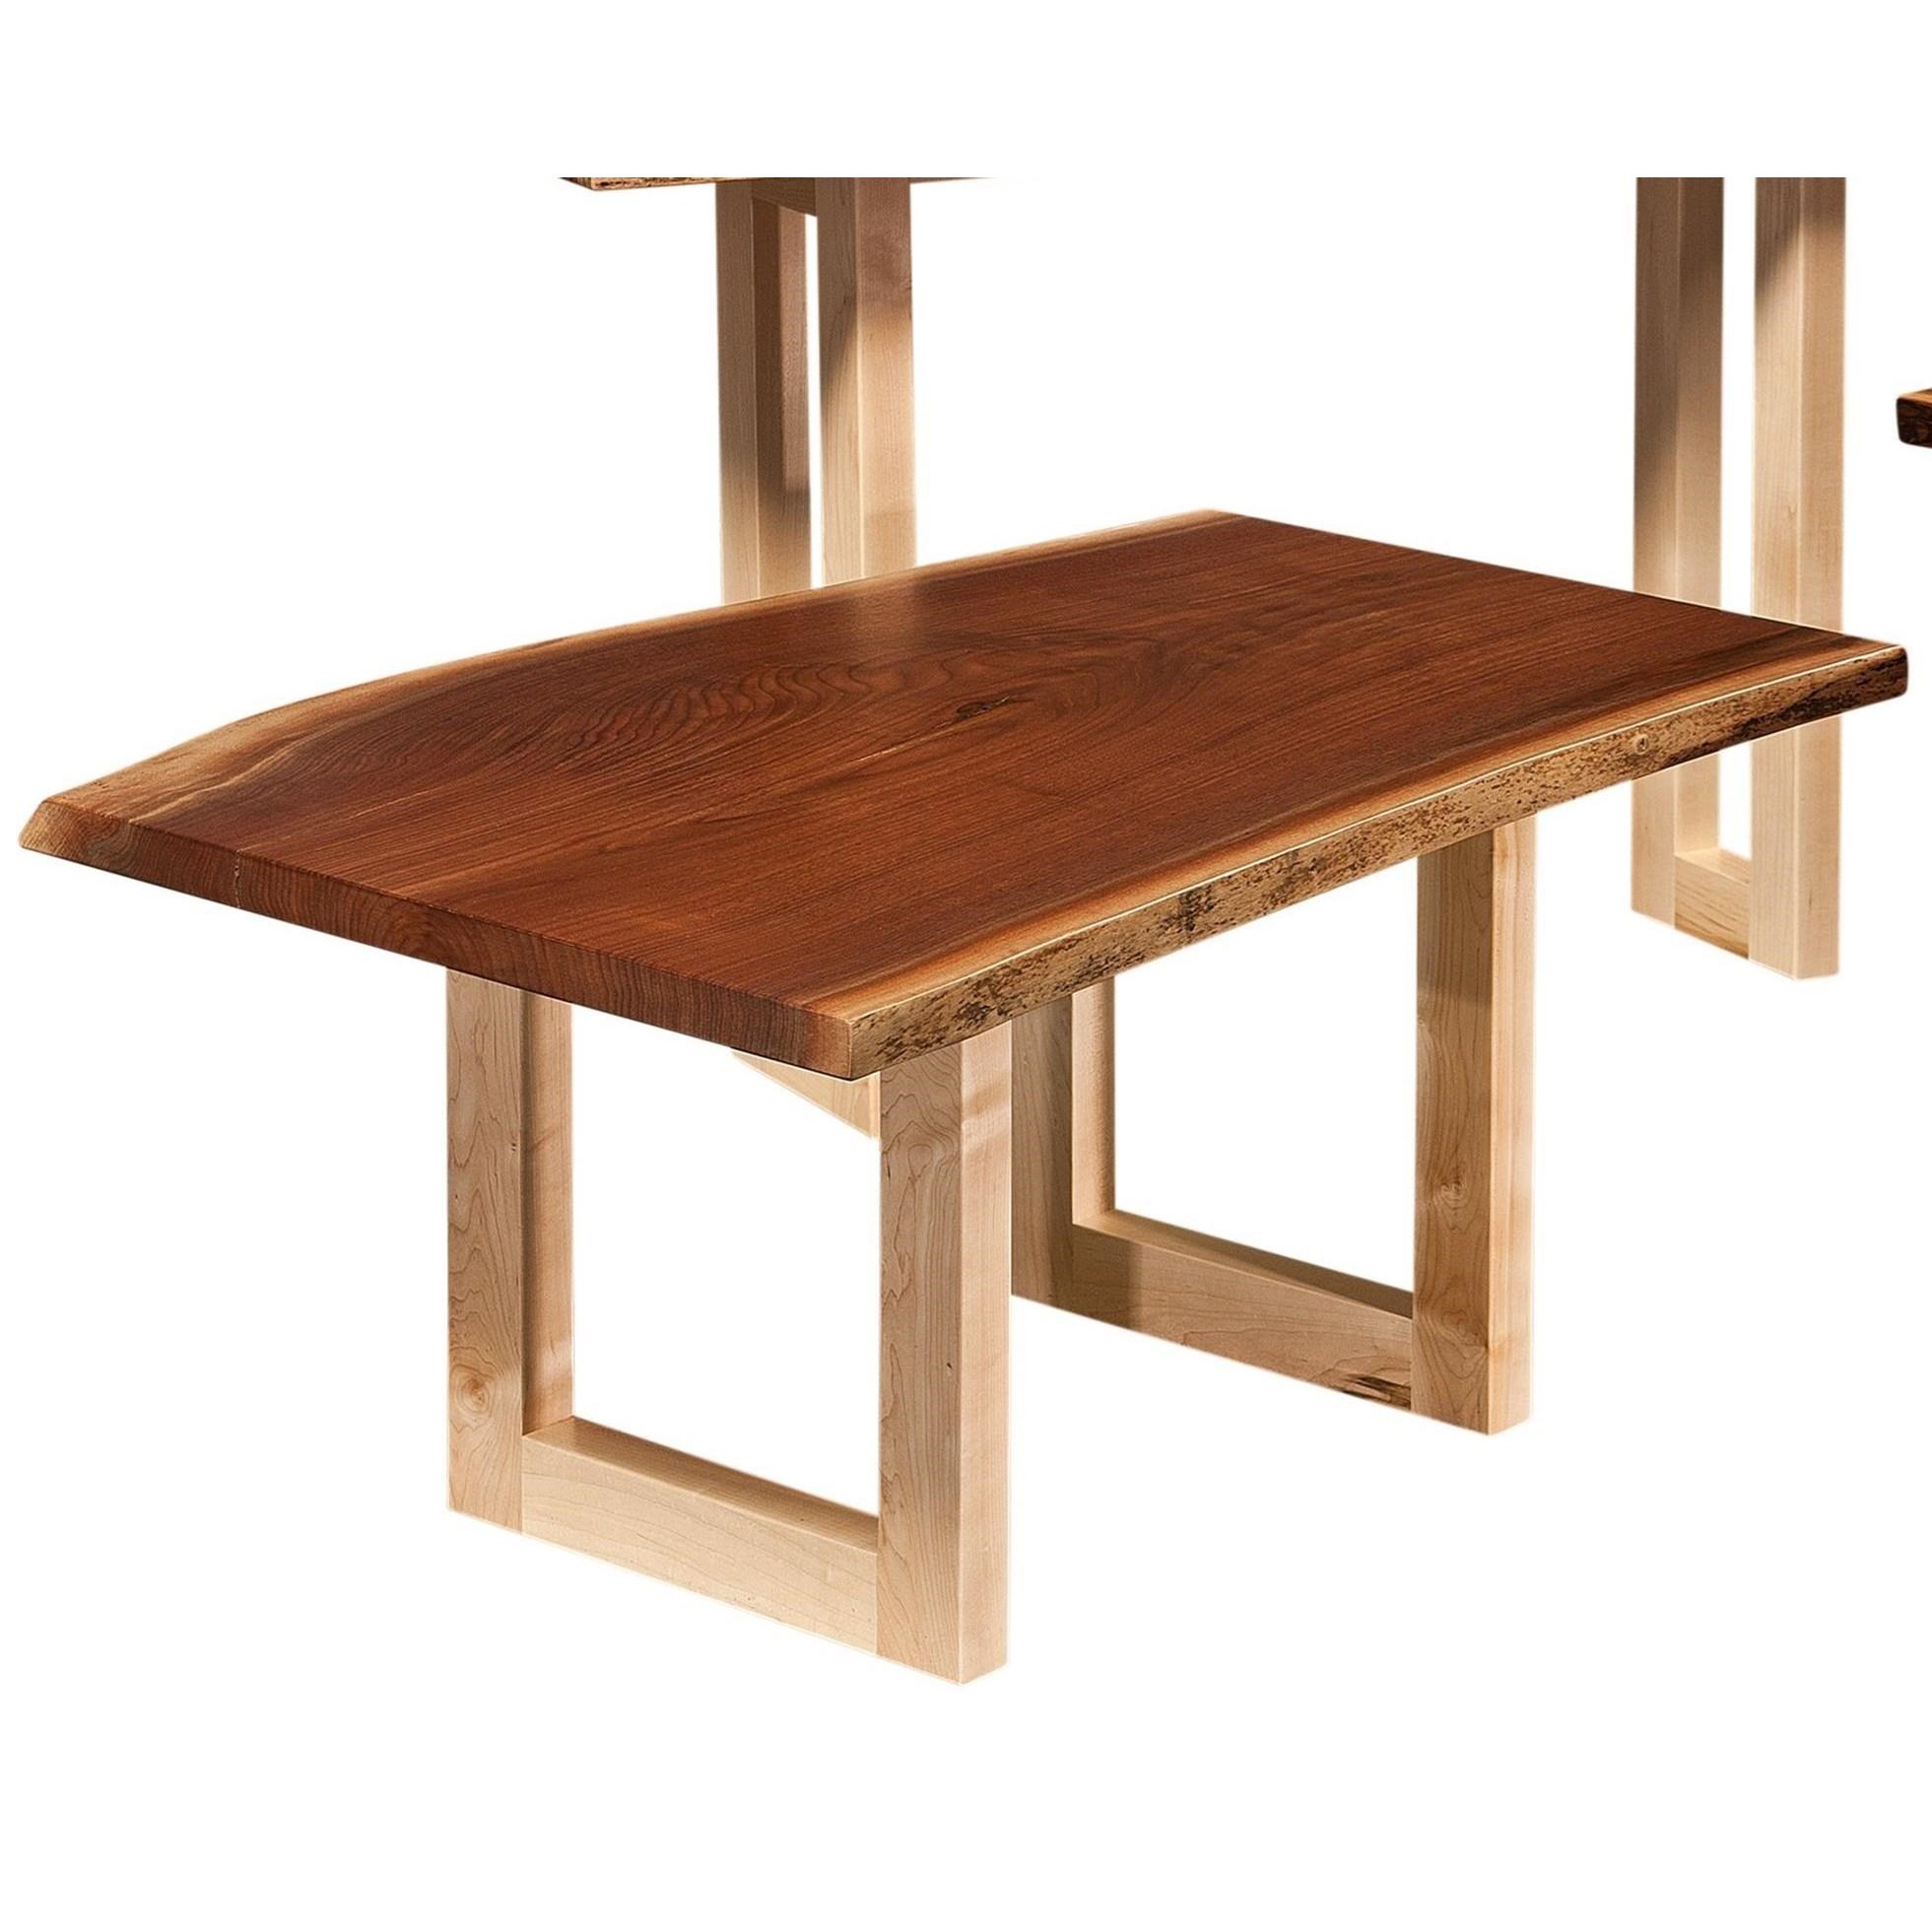 Kalispel Live Edge Coffee Table by Crystal Valley Hardwoods at Saugerties Furniture Mart